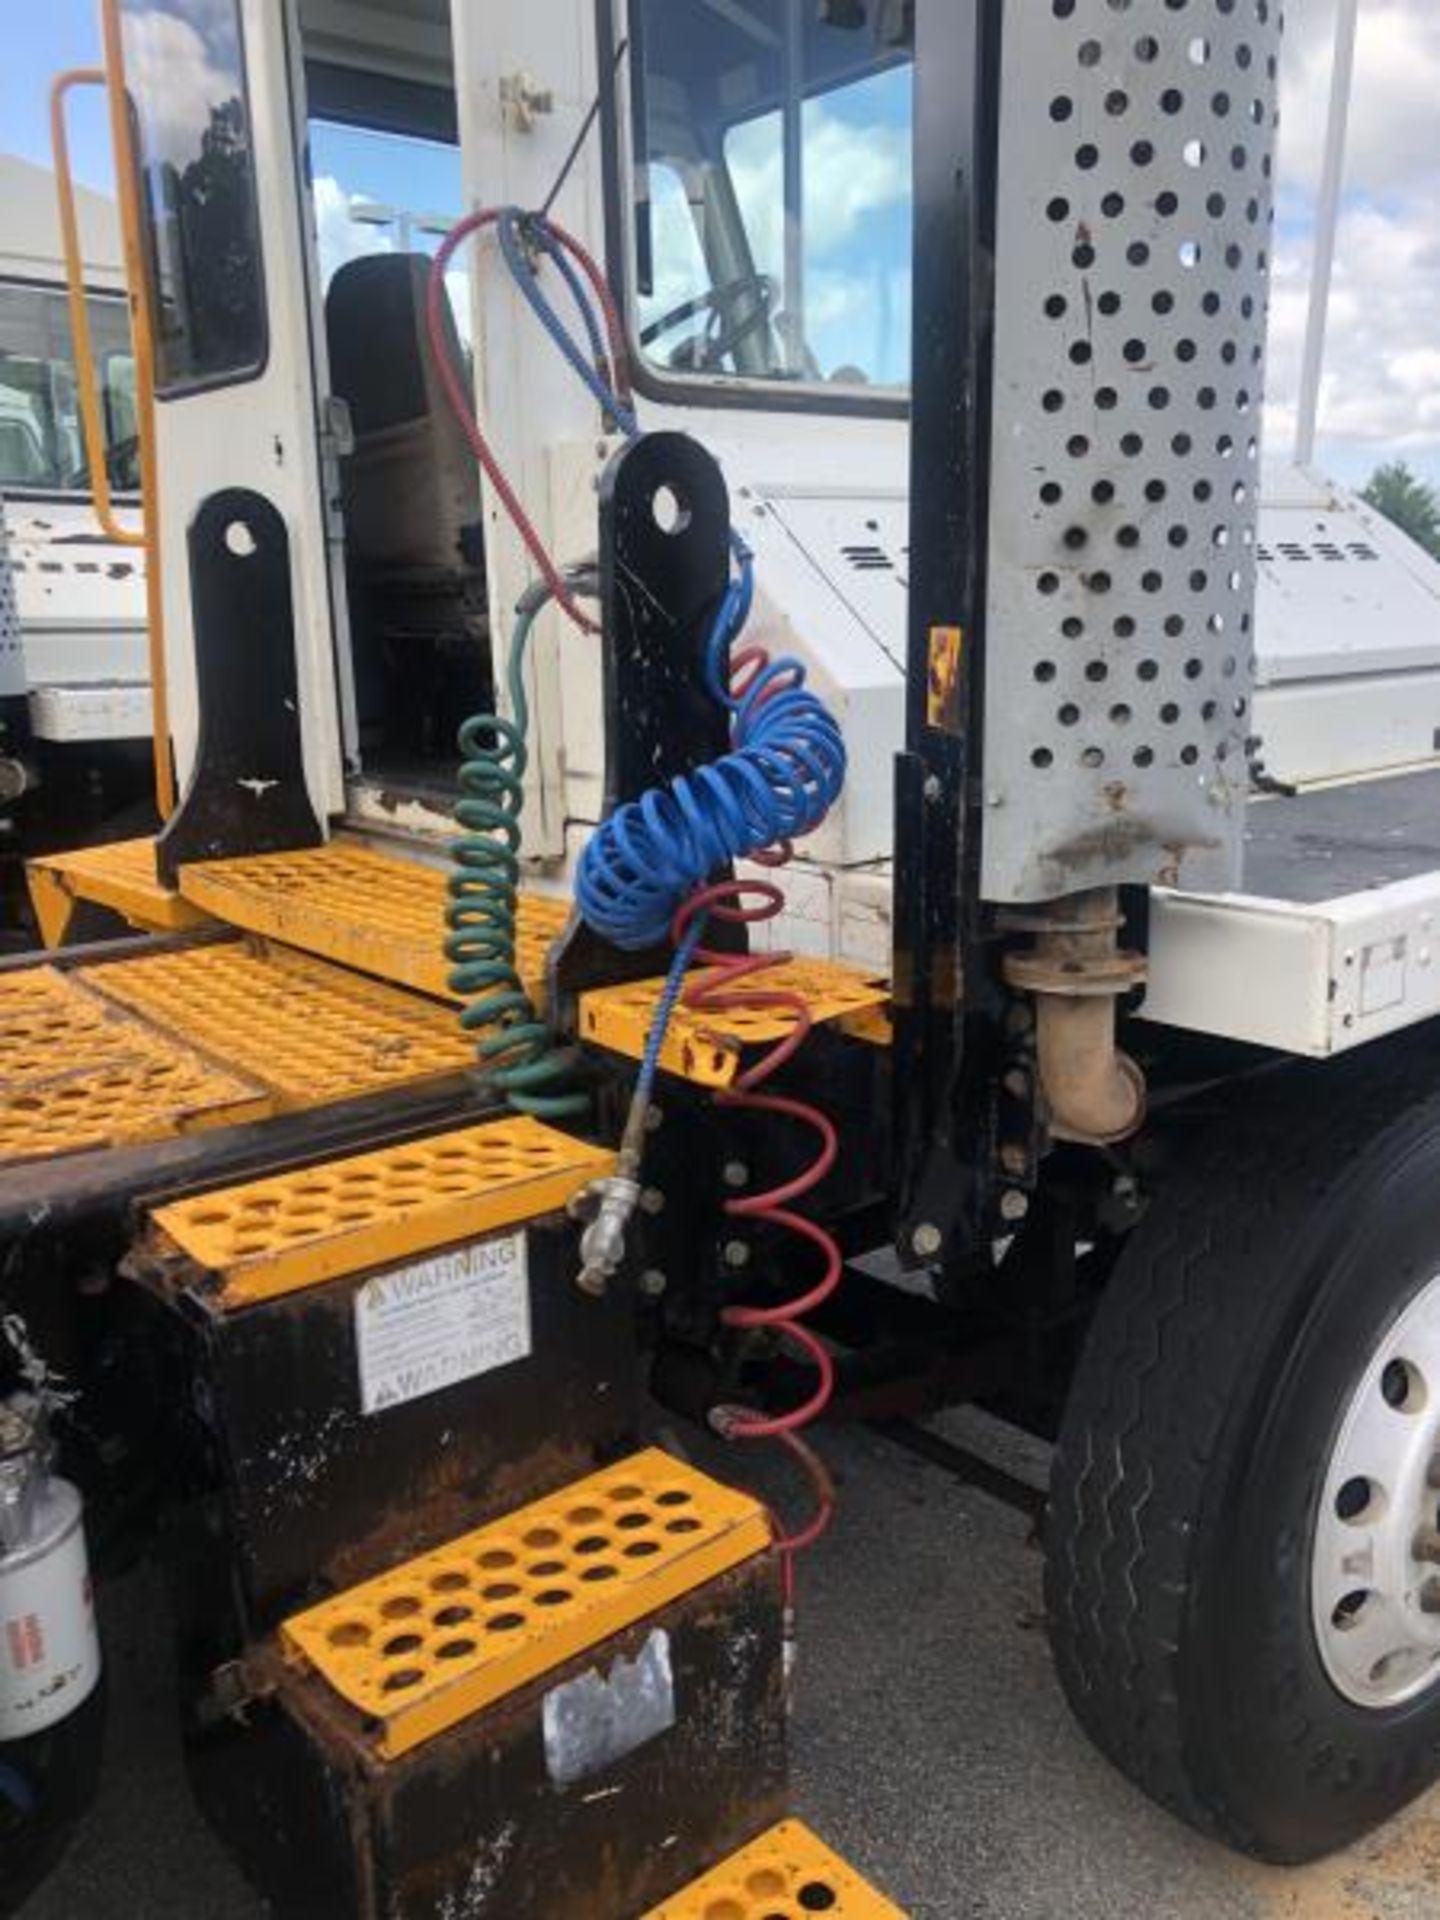 2015 Kalmar Ottawa 4x2 Yard Truck , SN: 338845 2,600.5 Hours, 185 Miles - Image 12 of 27